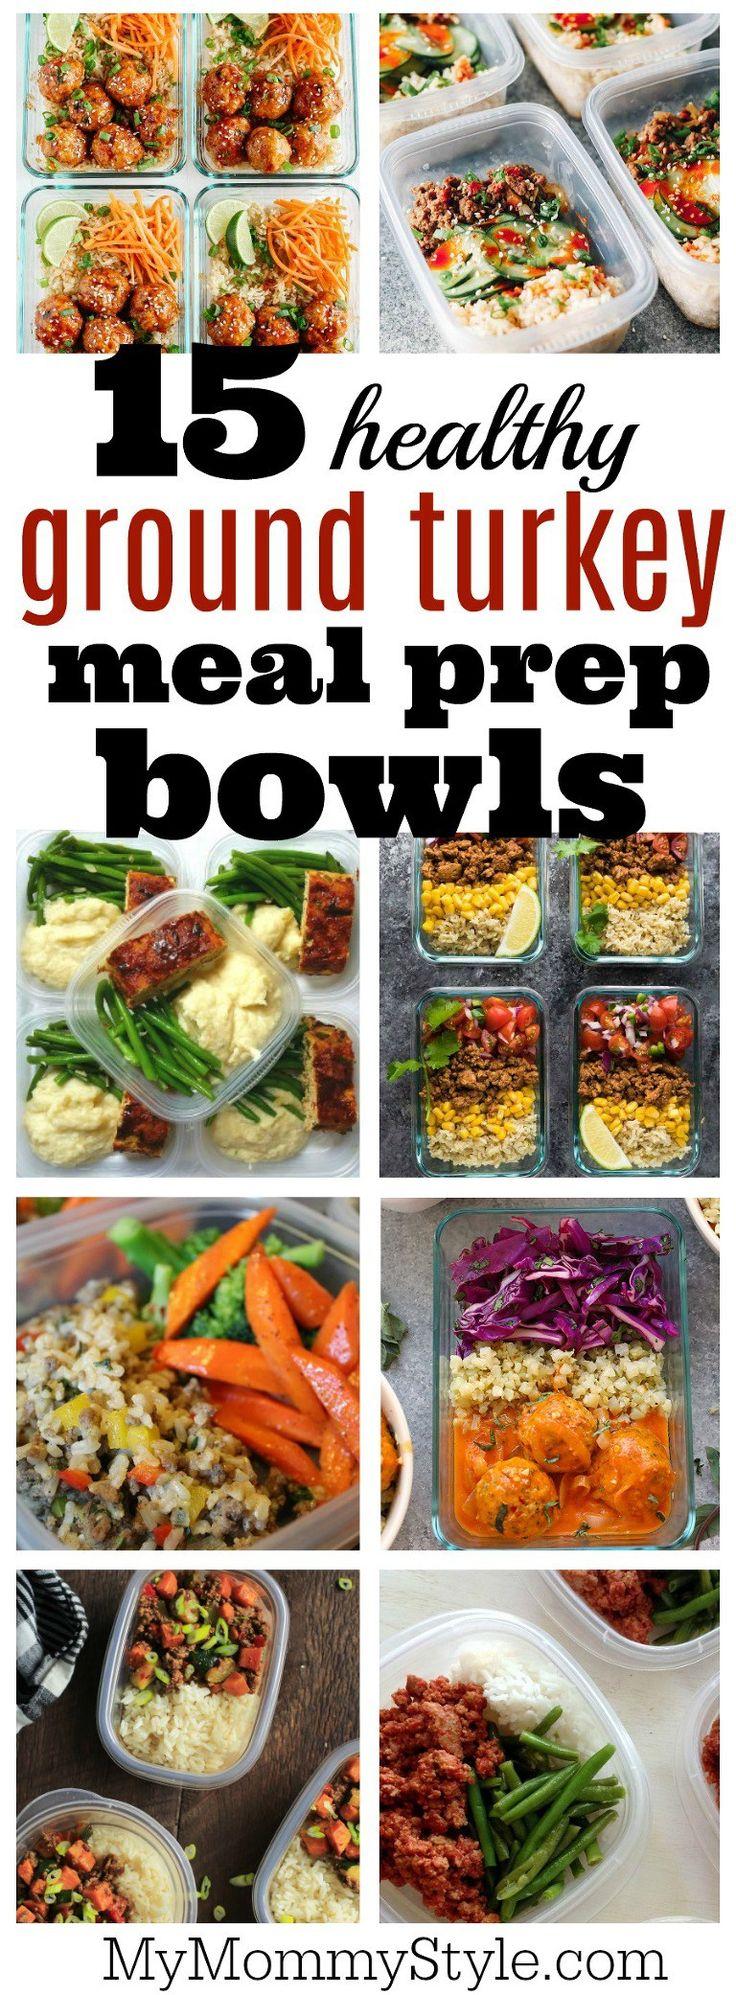 15 healthy ground turkey meal prep bowls